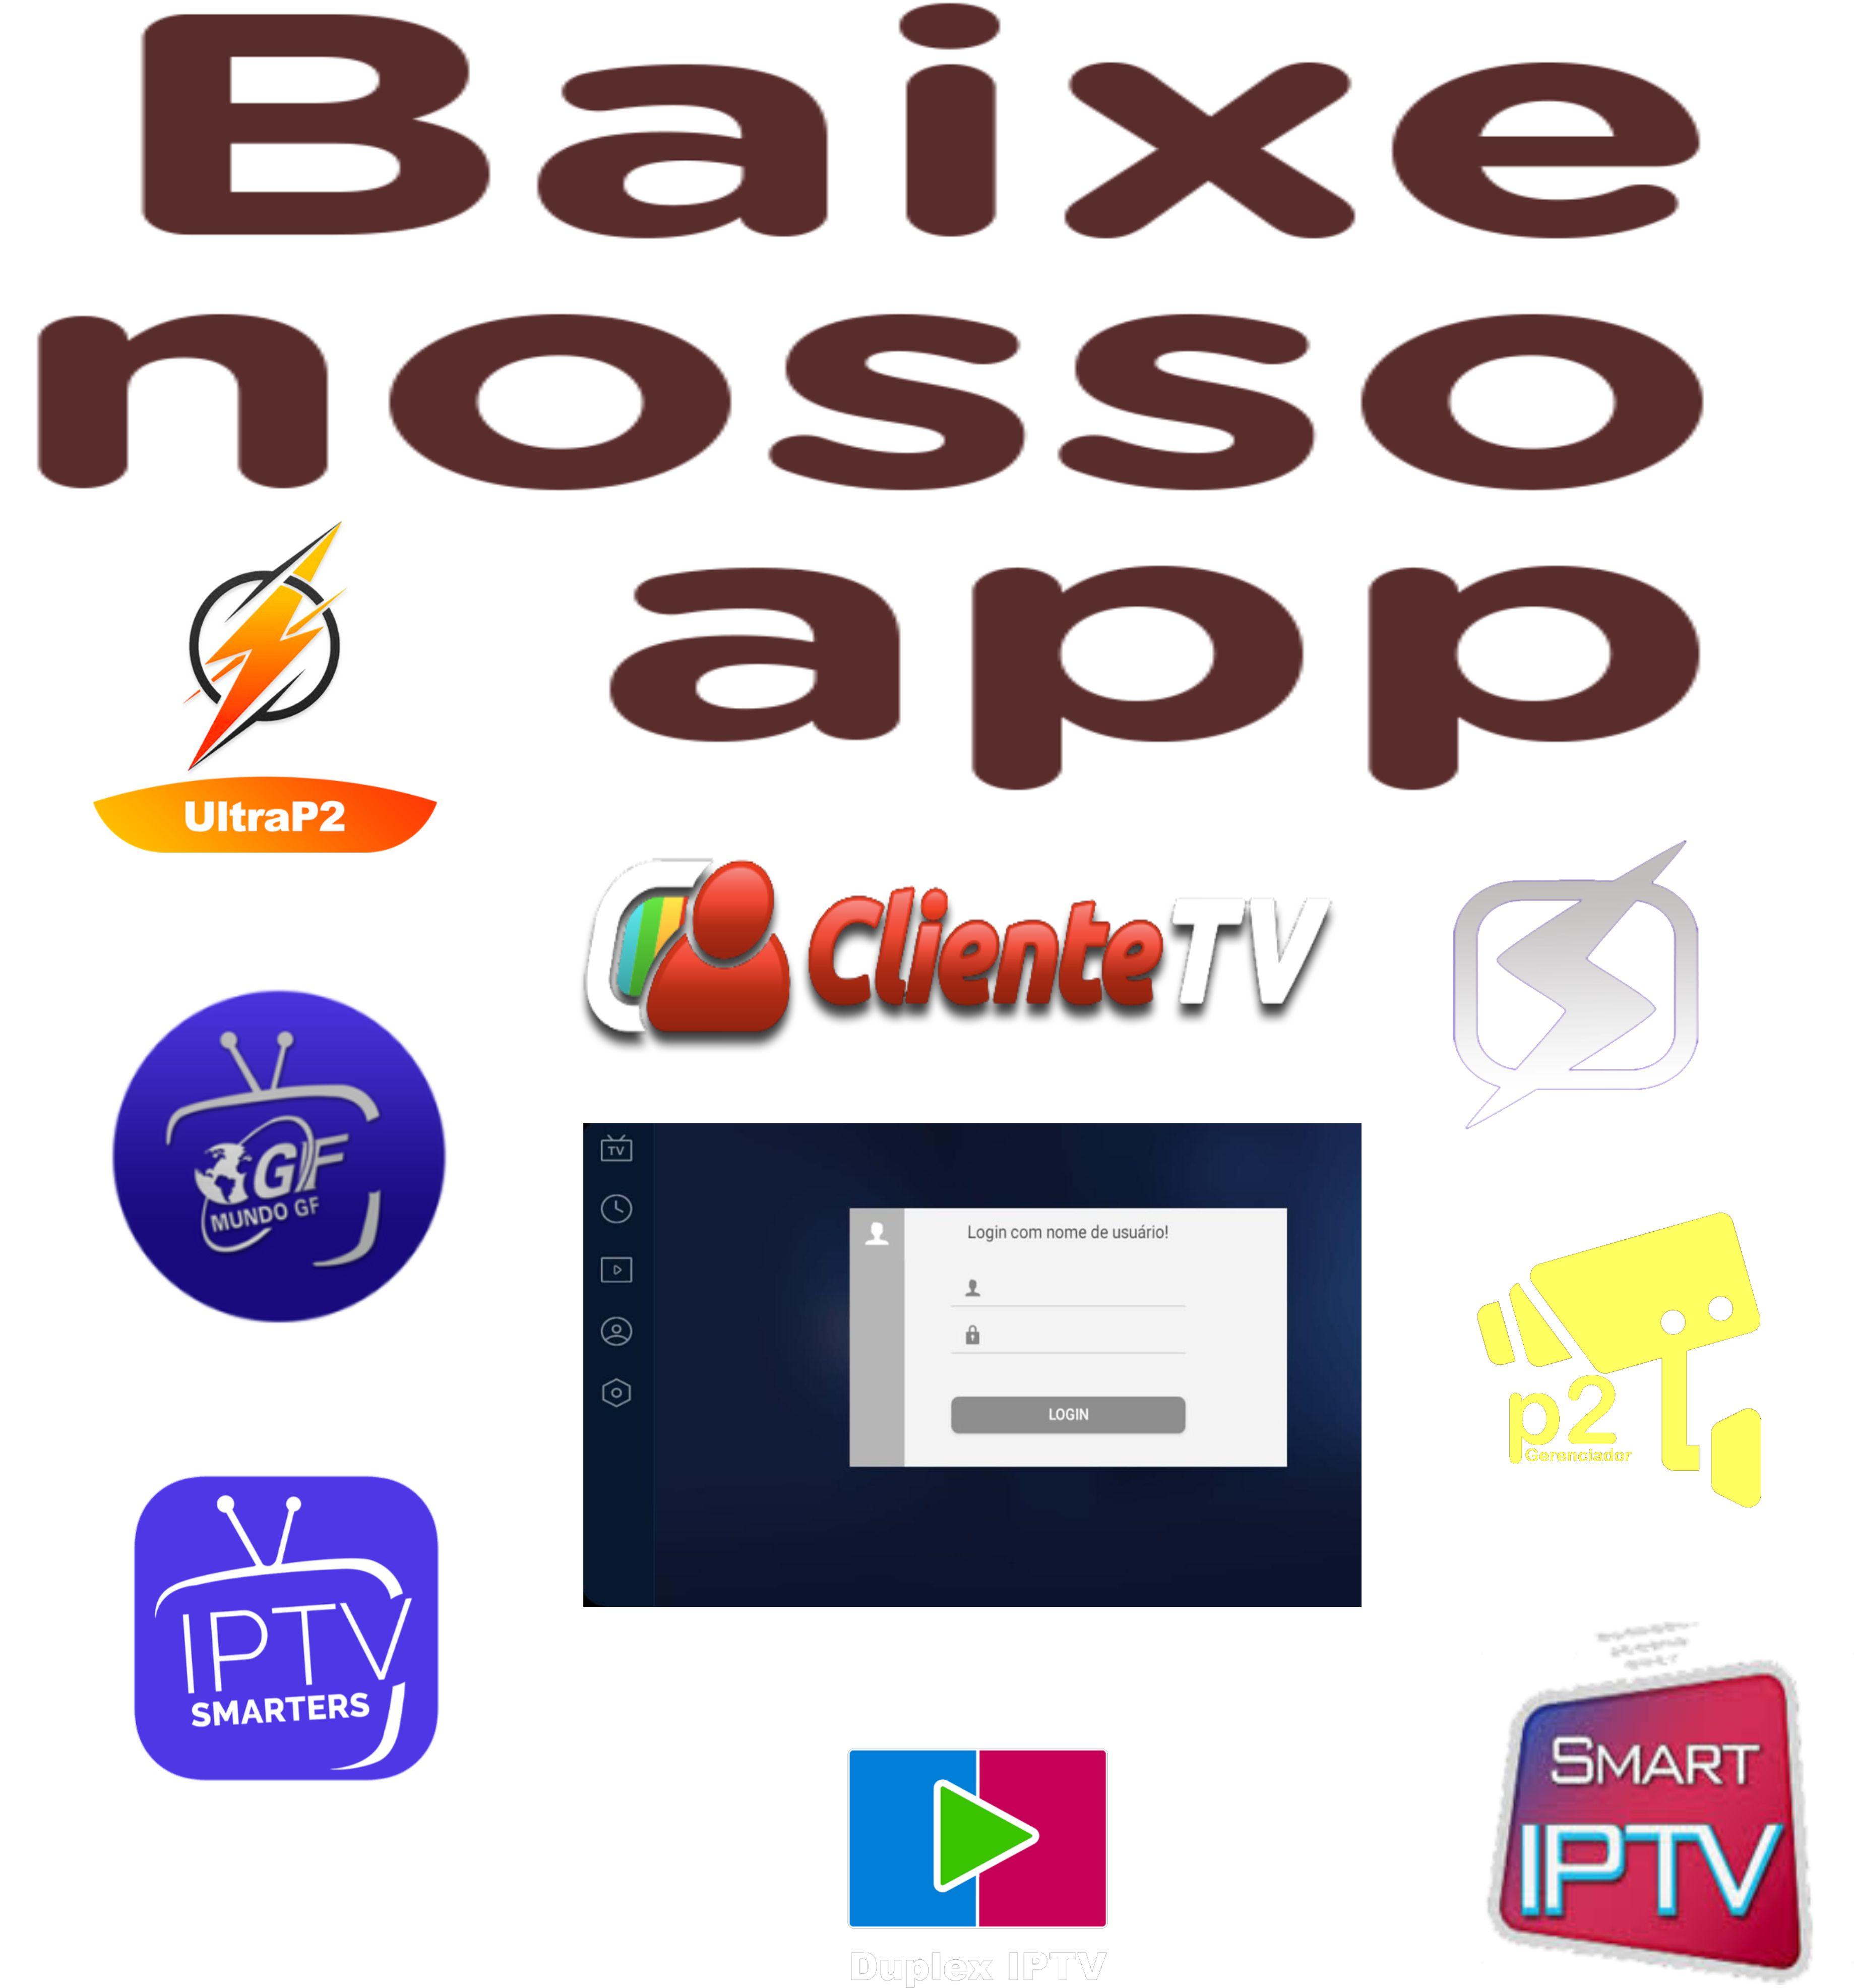 i.ibb.co/mJR833B/Banners-Nossos-Apps.jpg